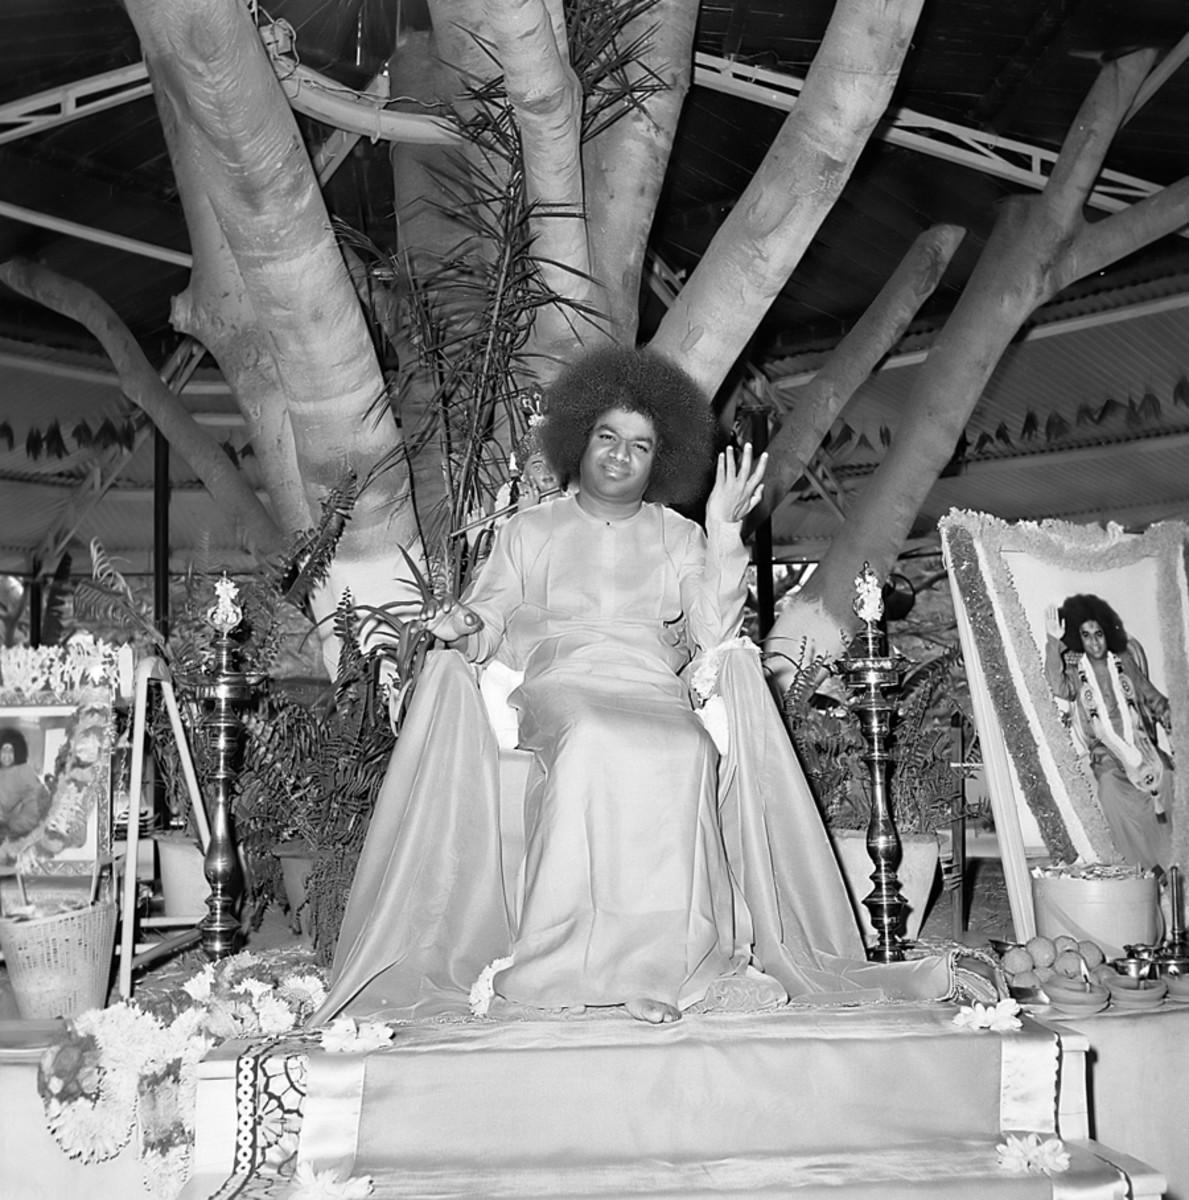 Sri Sathya Sai Baba at His Brindavan residence ( Bangalore) in the 1960s